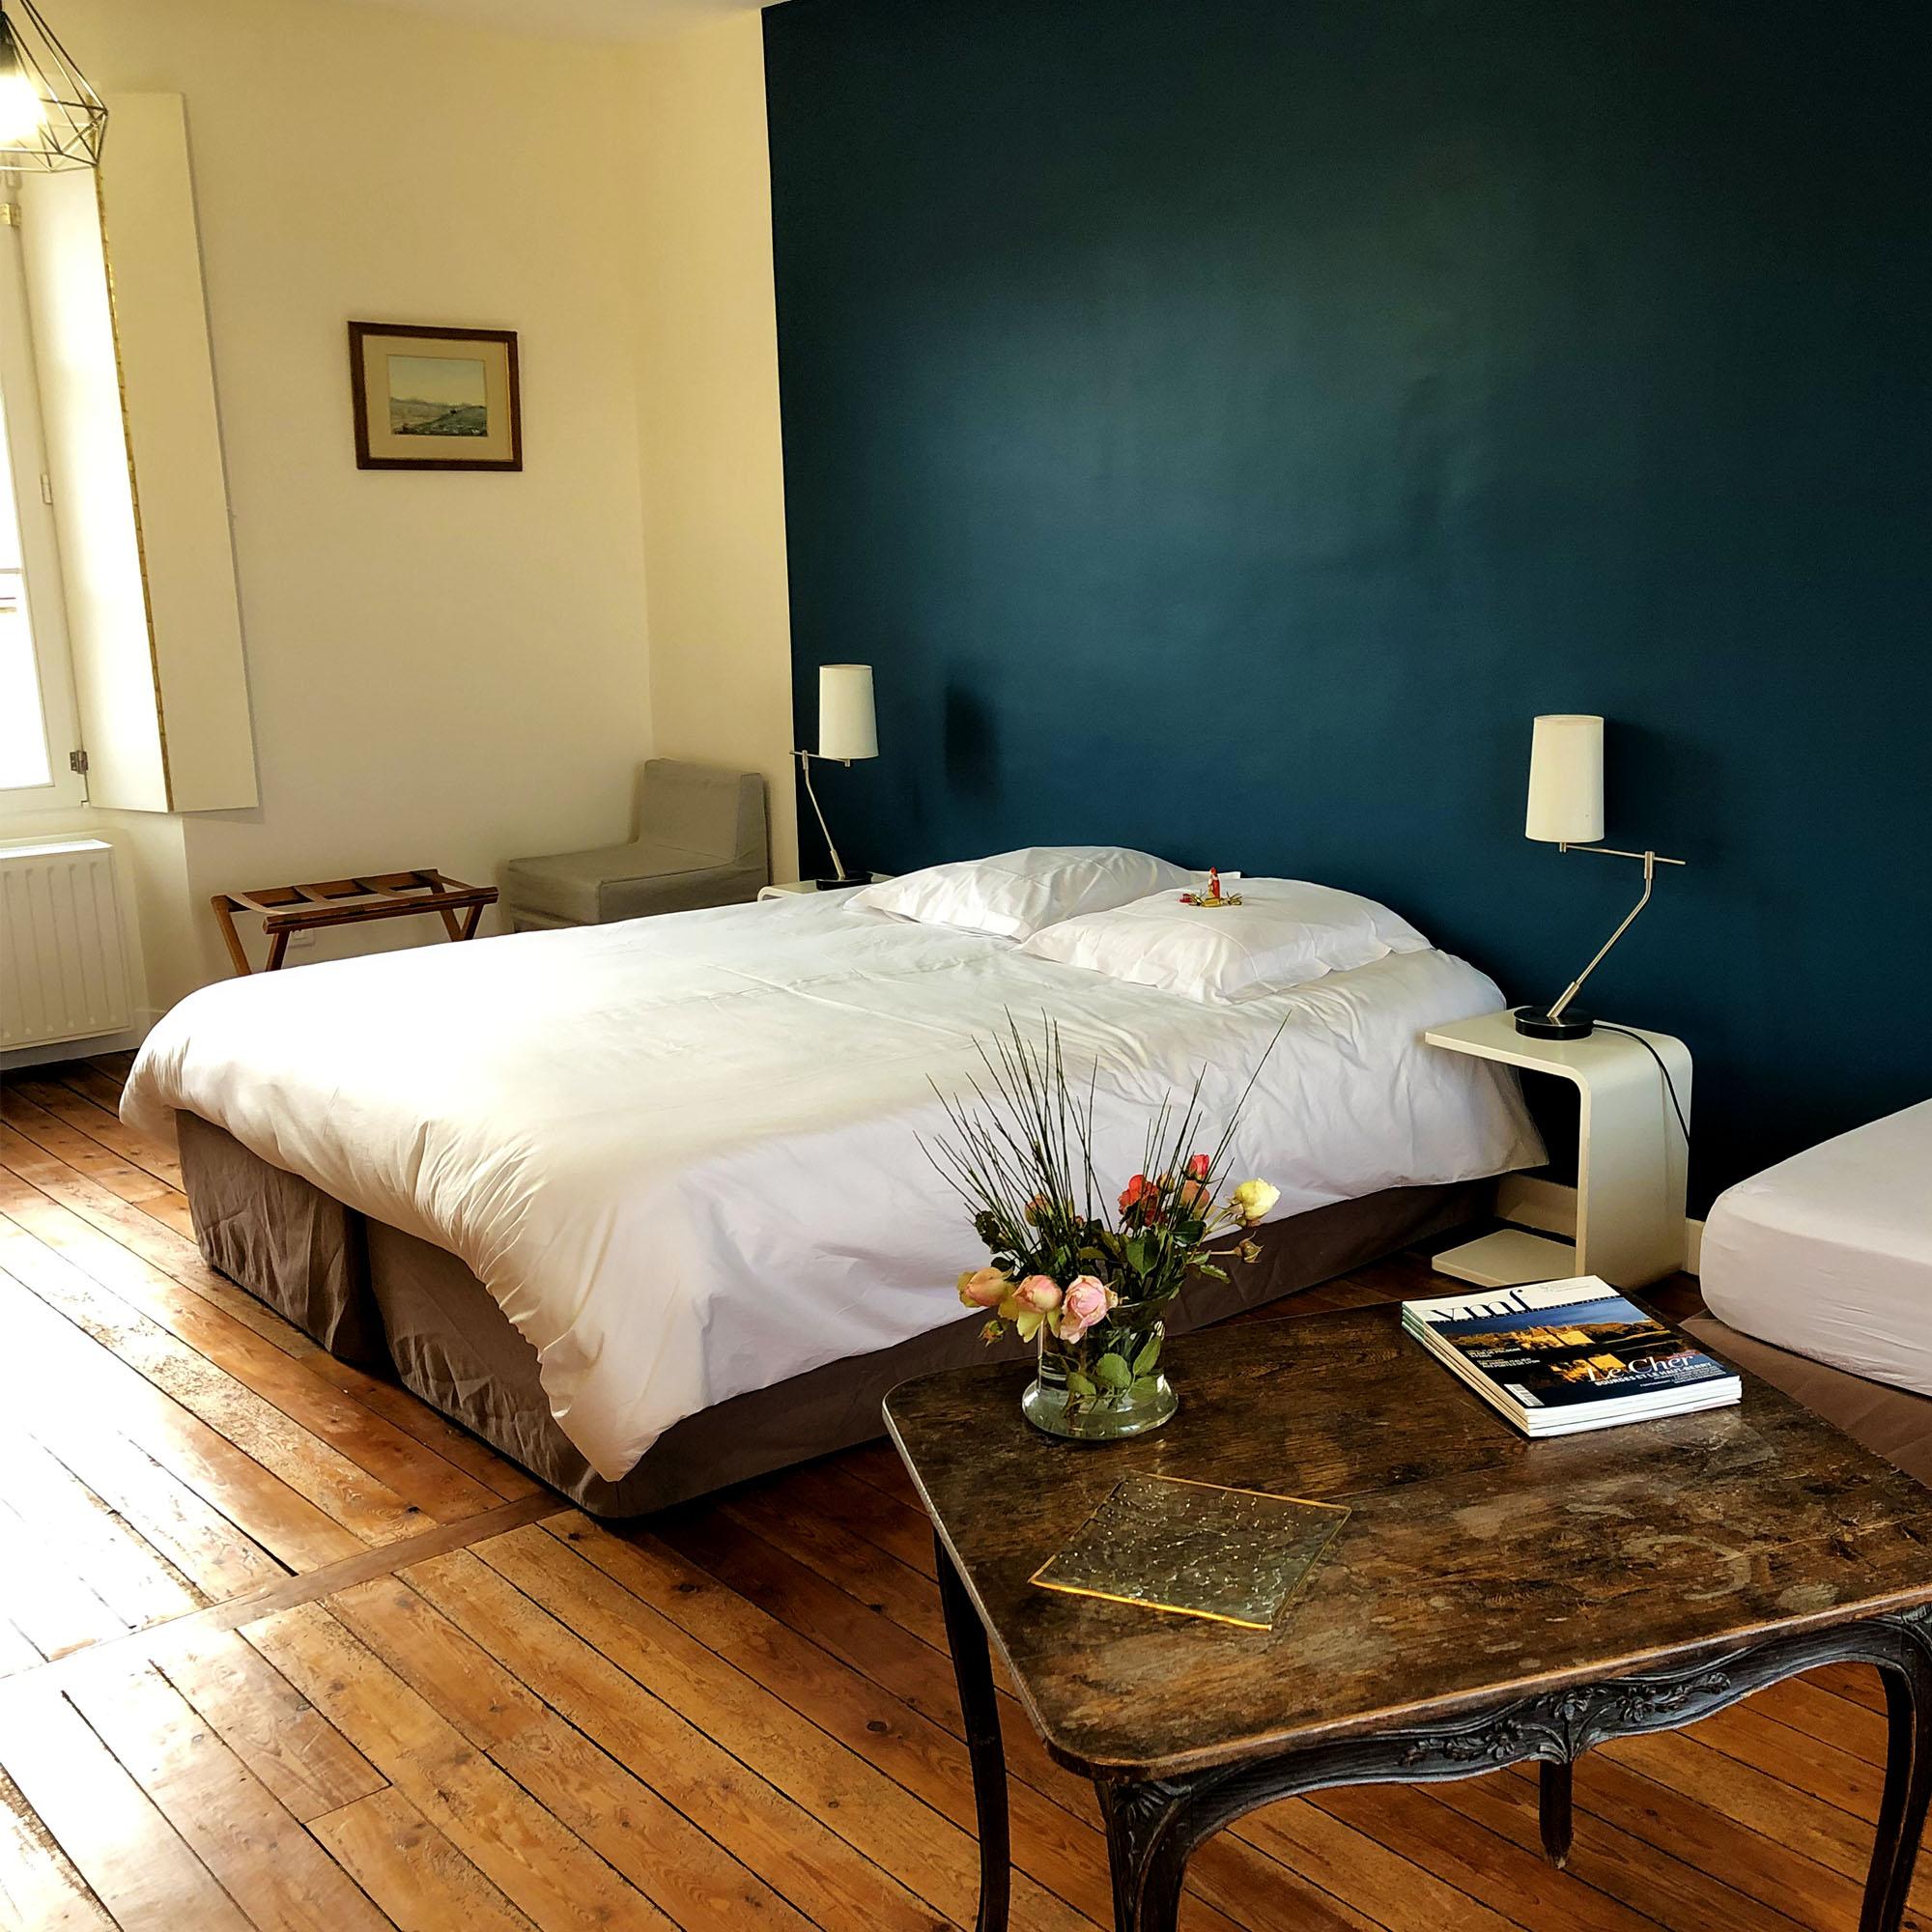 chambre2_gîte_saint_germain_oise_versigny